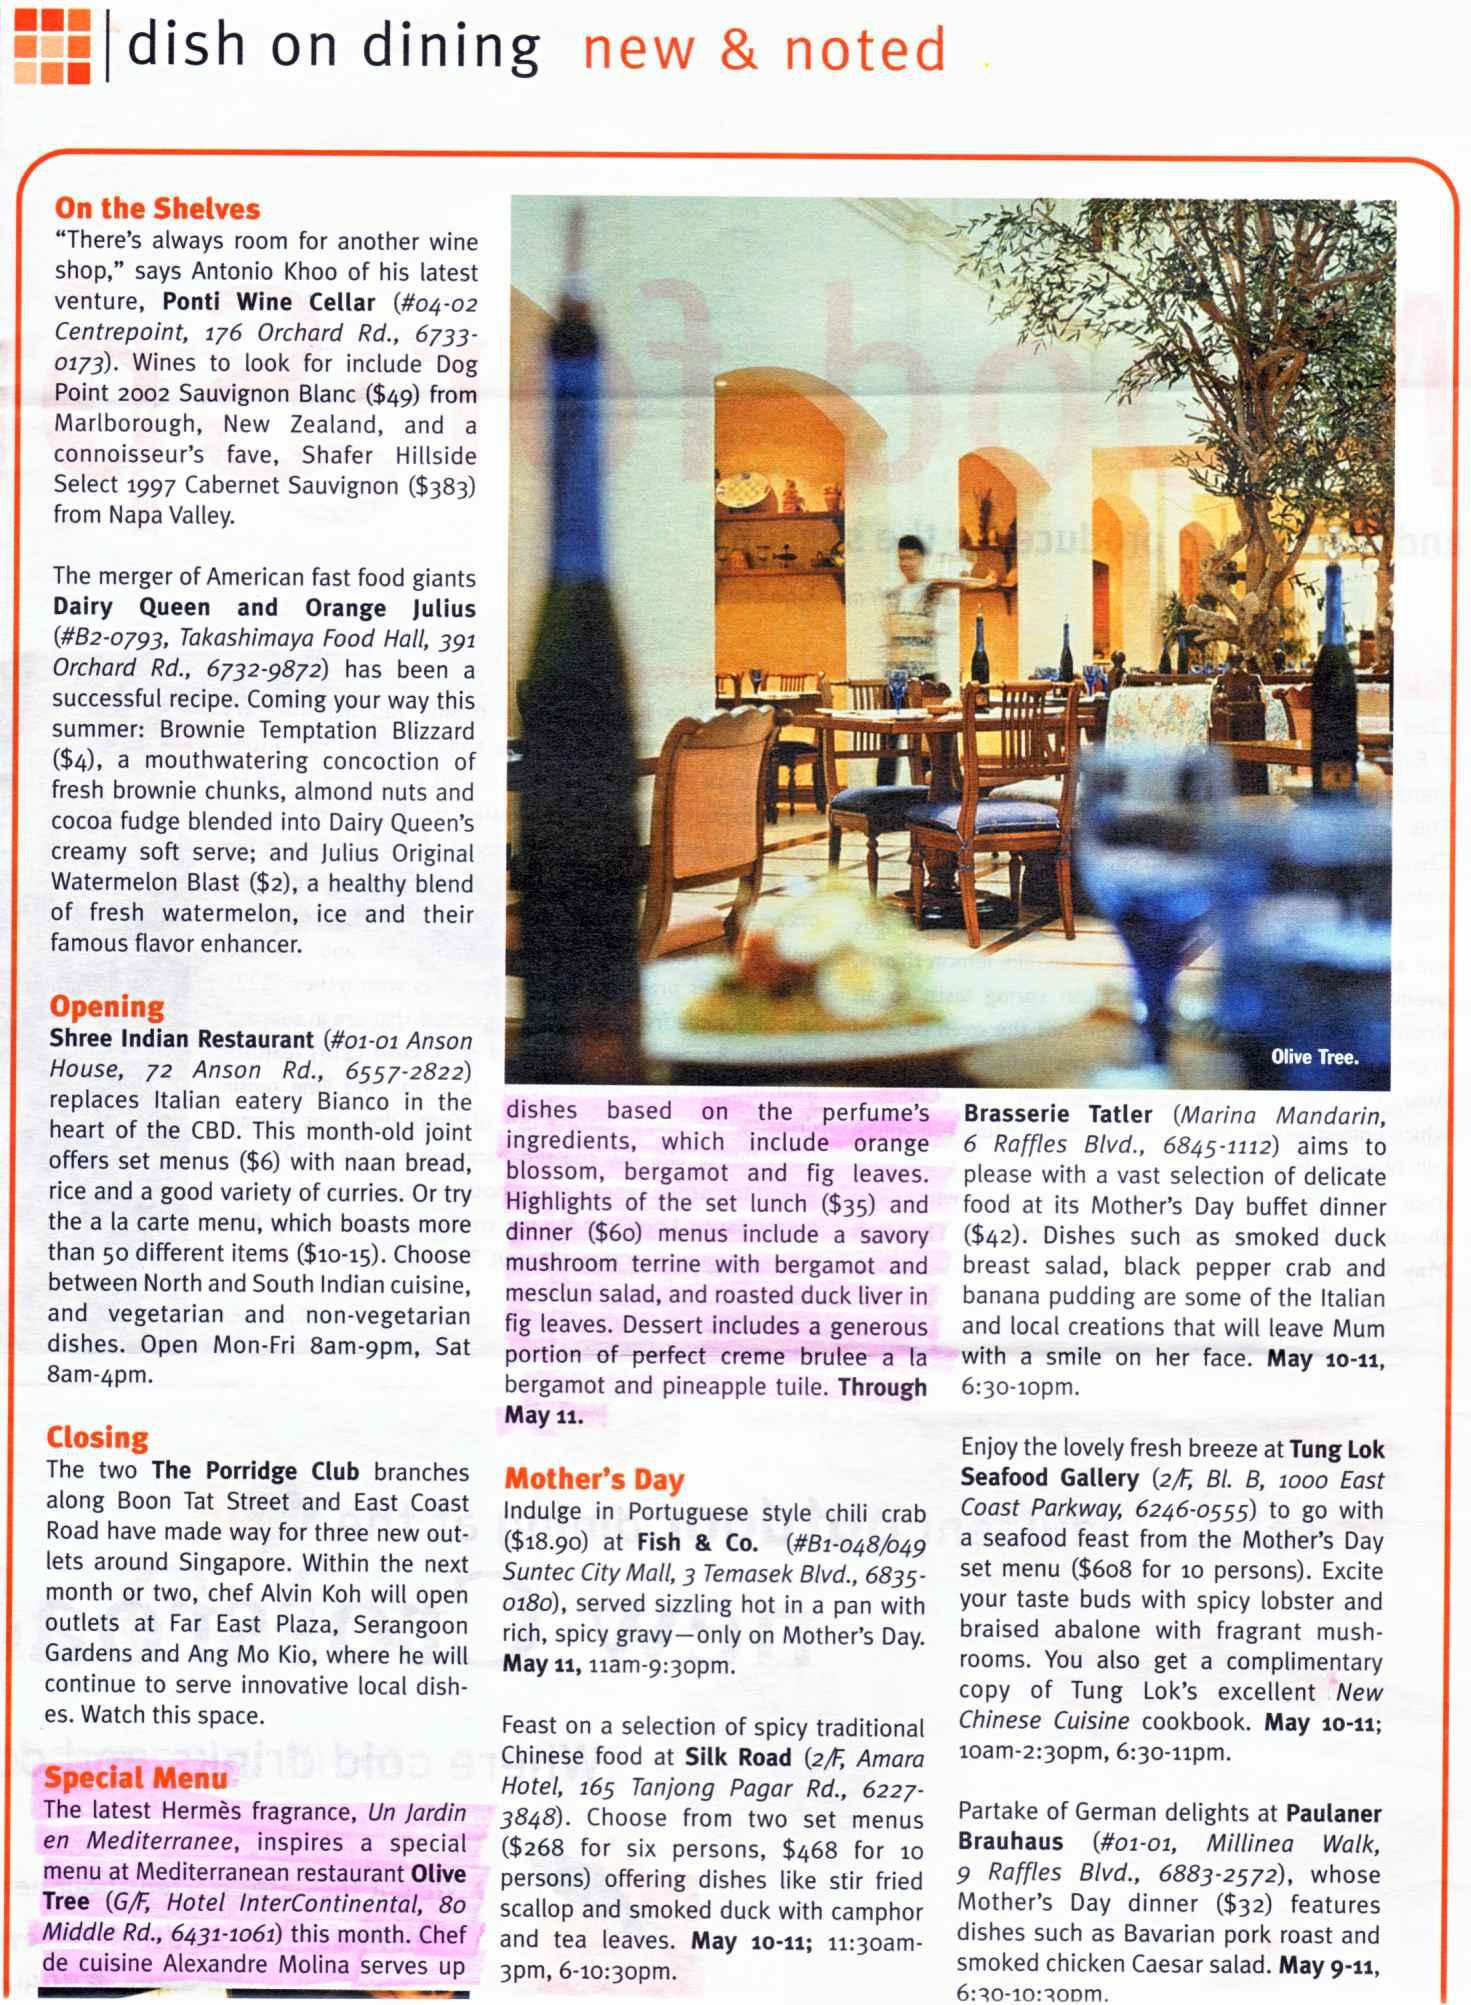 I-S Magazine May 2-15, 2003.jpg